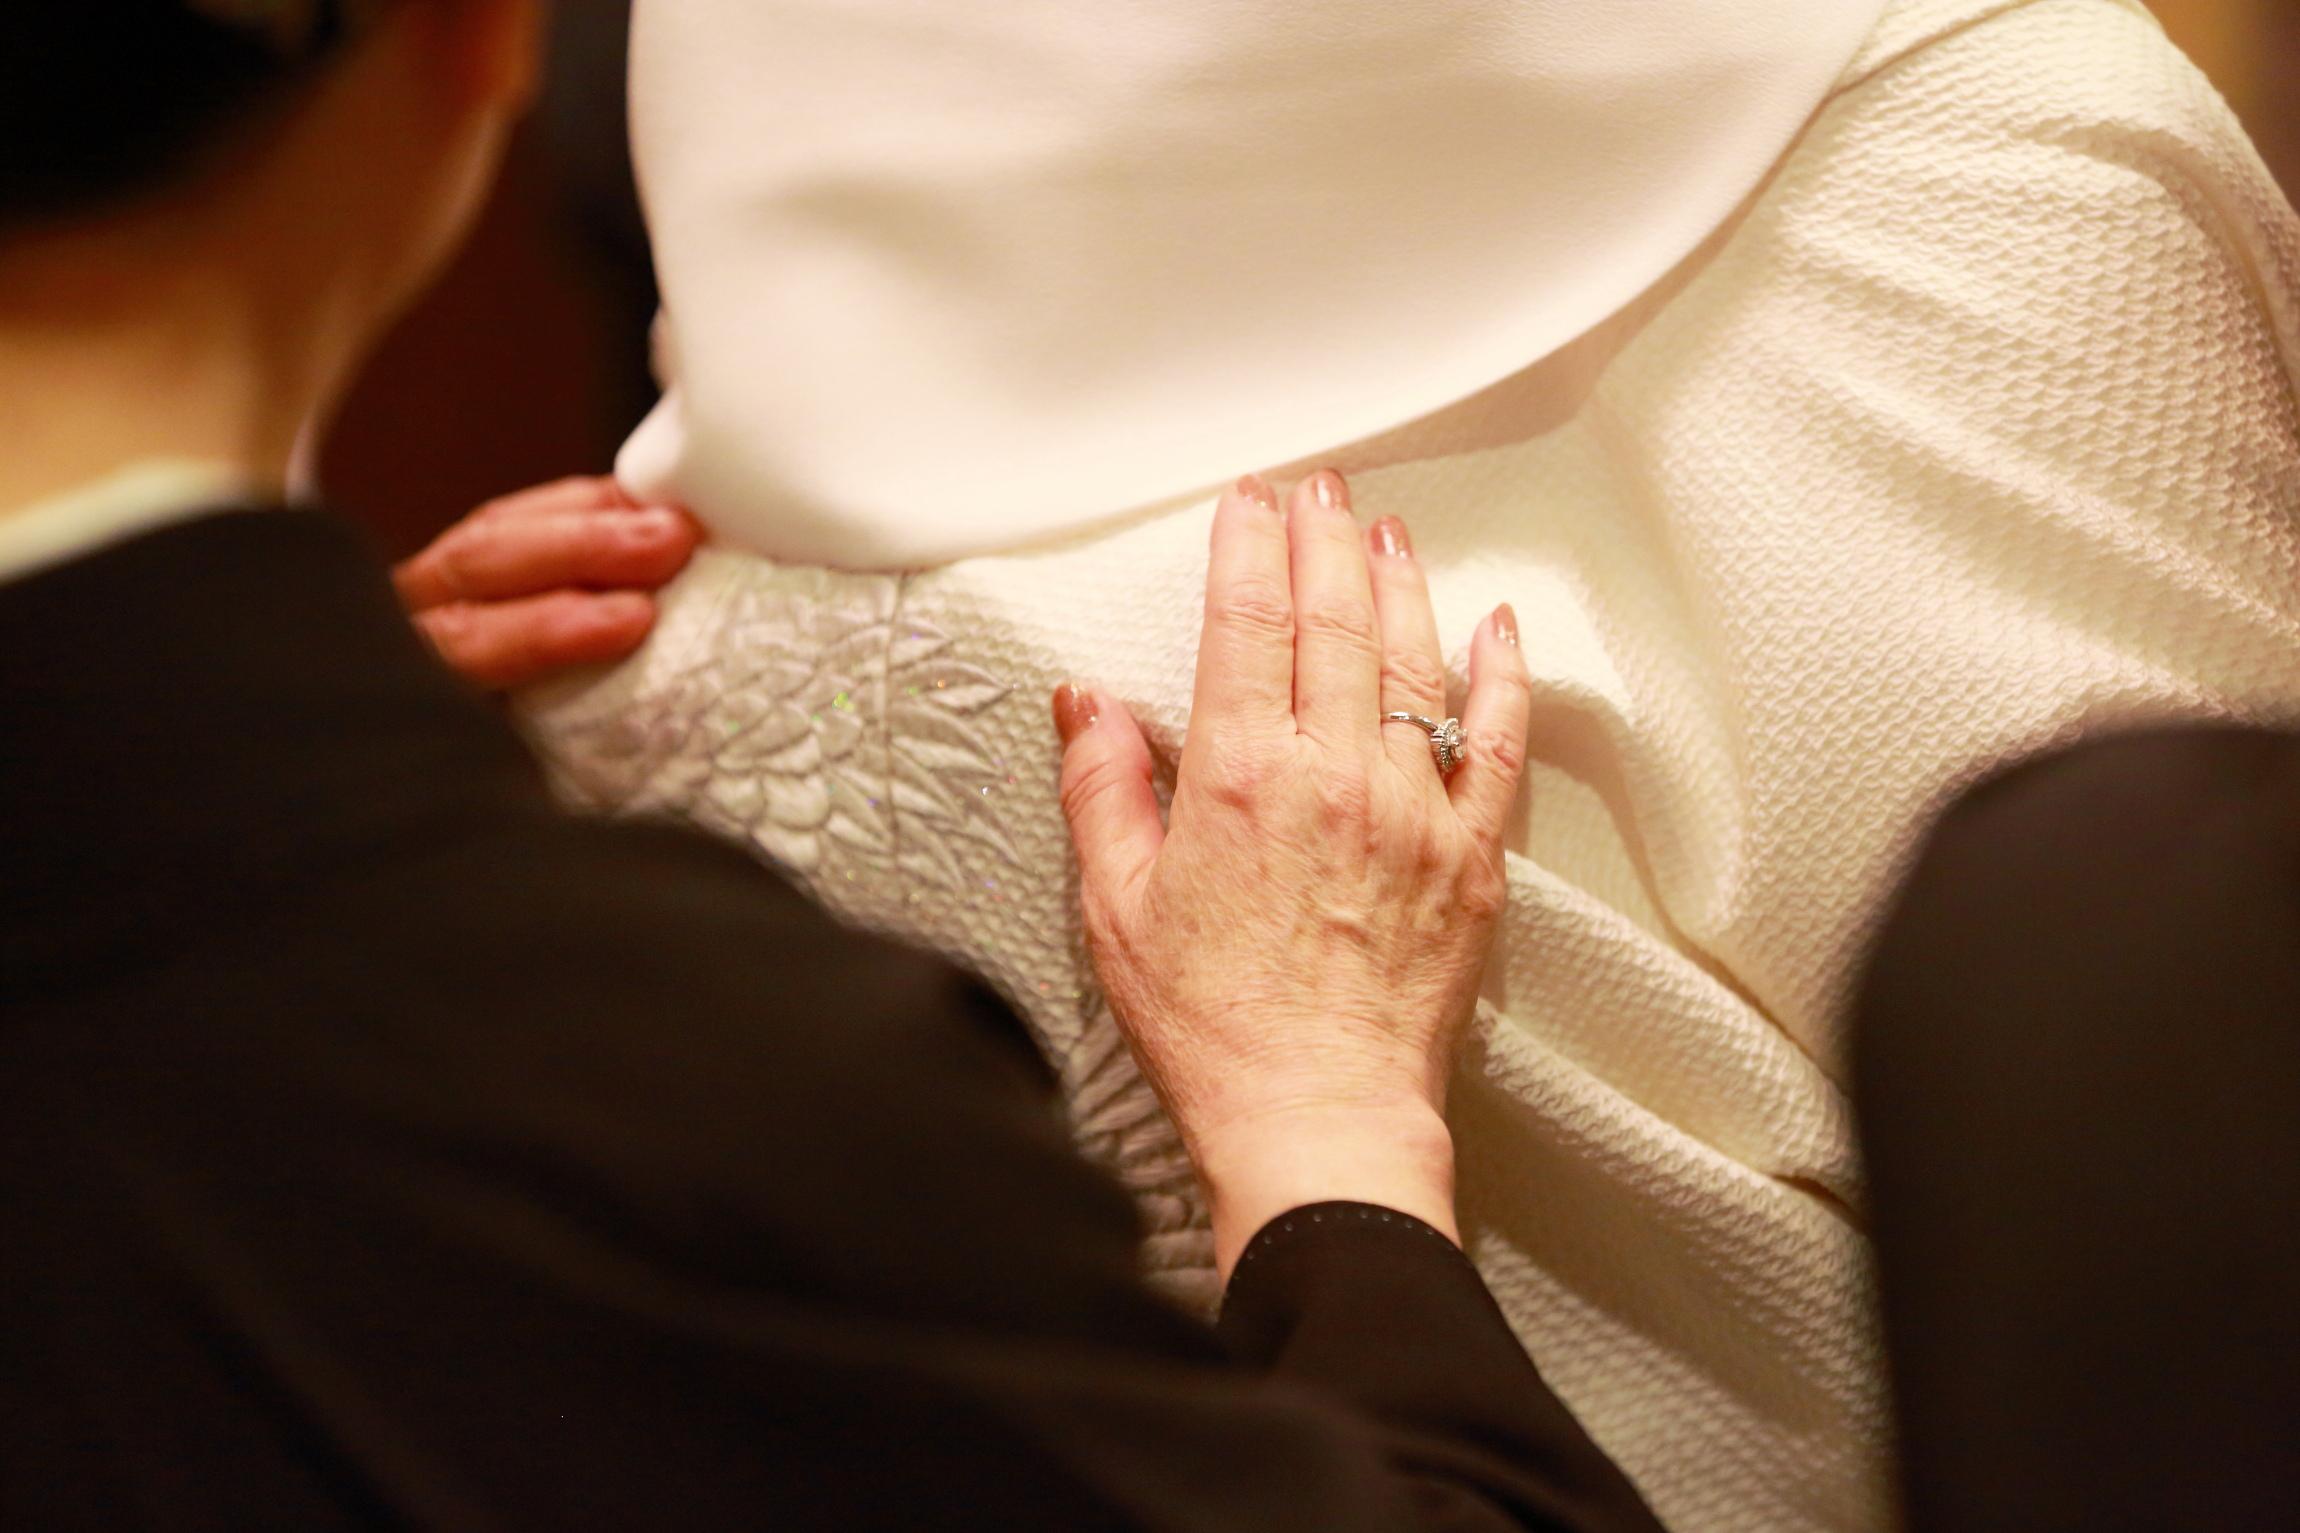 結婚式 国際結婚 白無垢 両親 和婚 披露宴 両親への挨拶